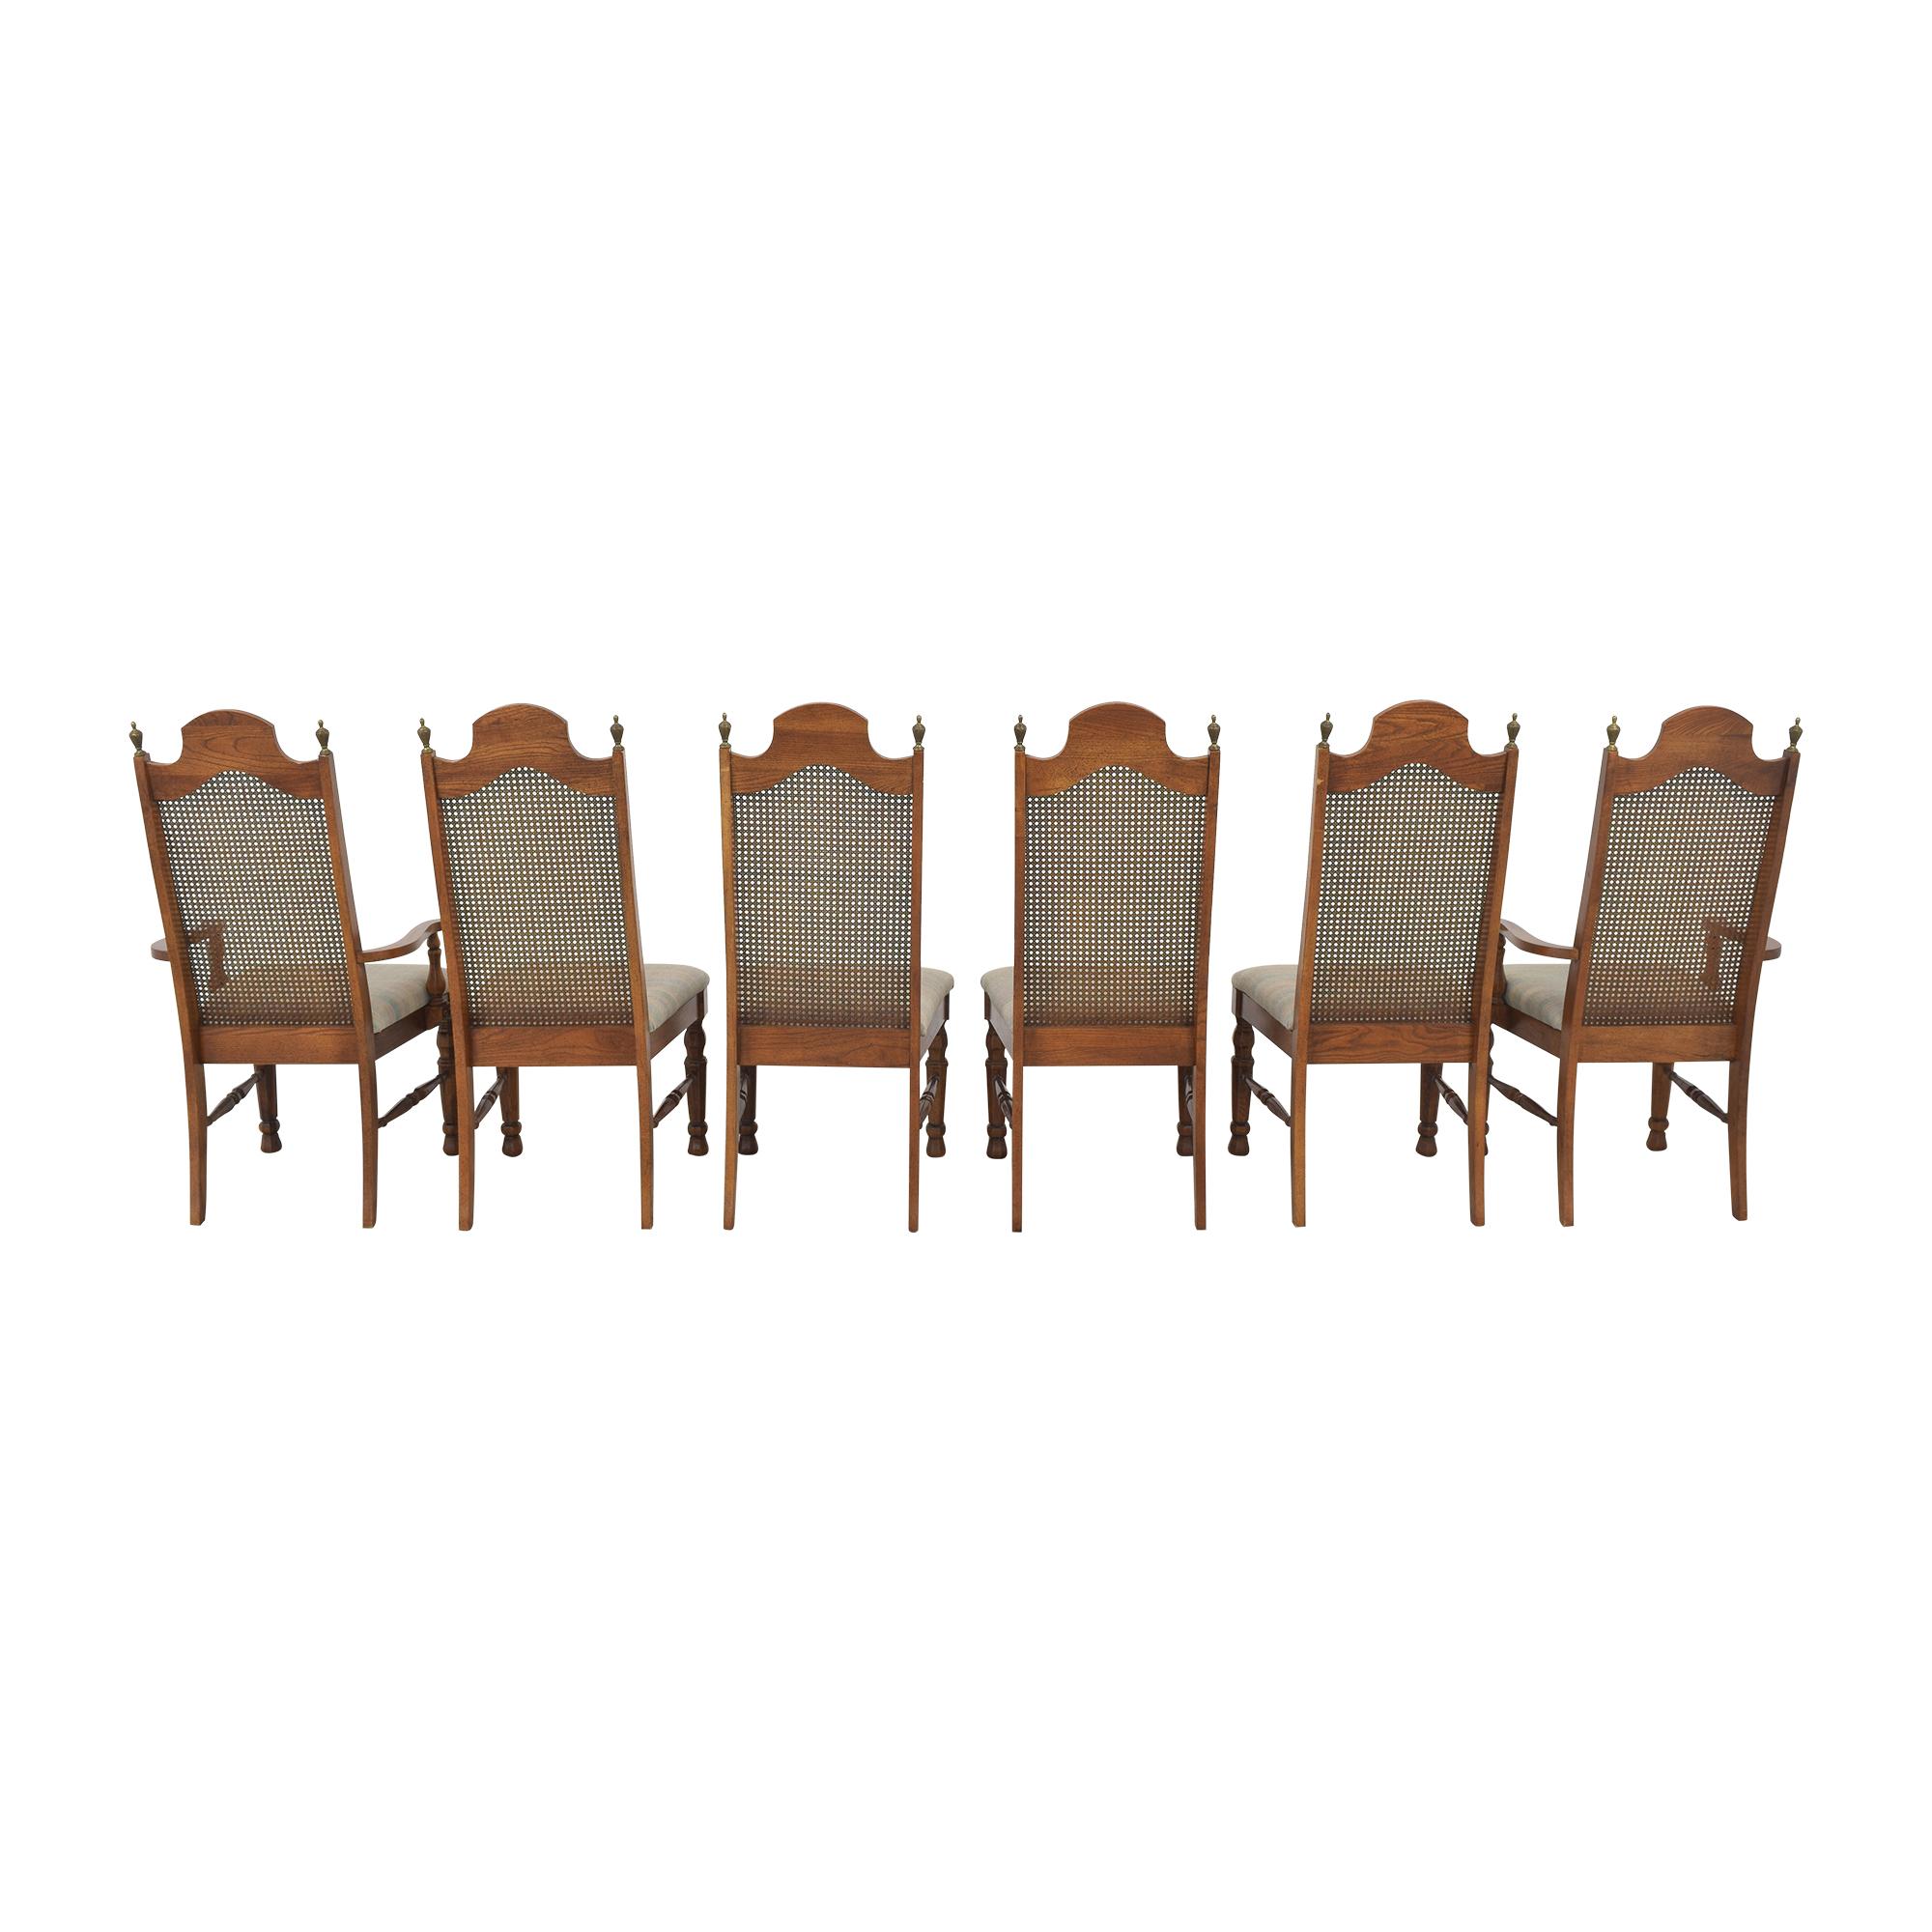 Lenoir Chair Company Lenoir Cane Back Dining Chairs price